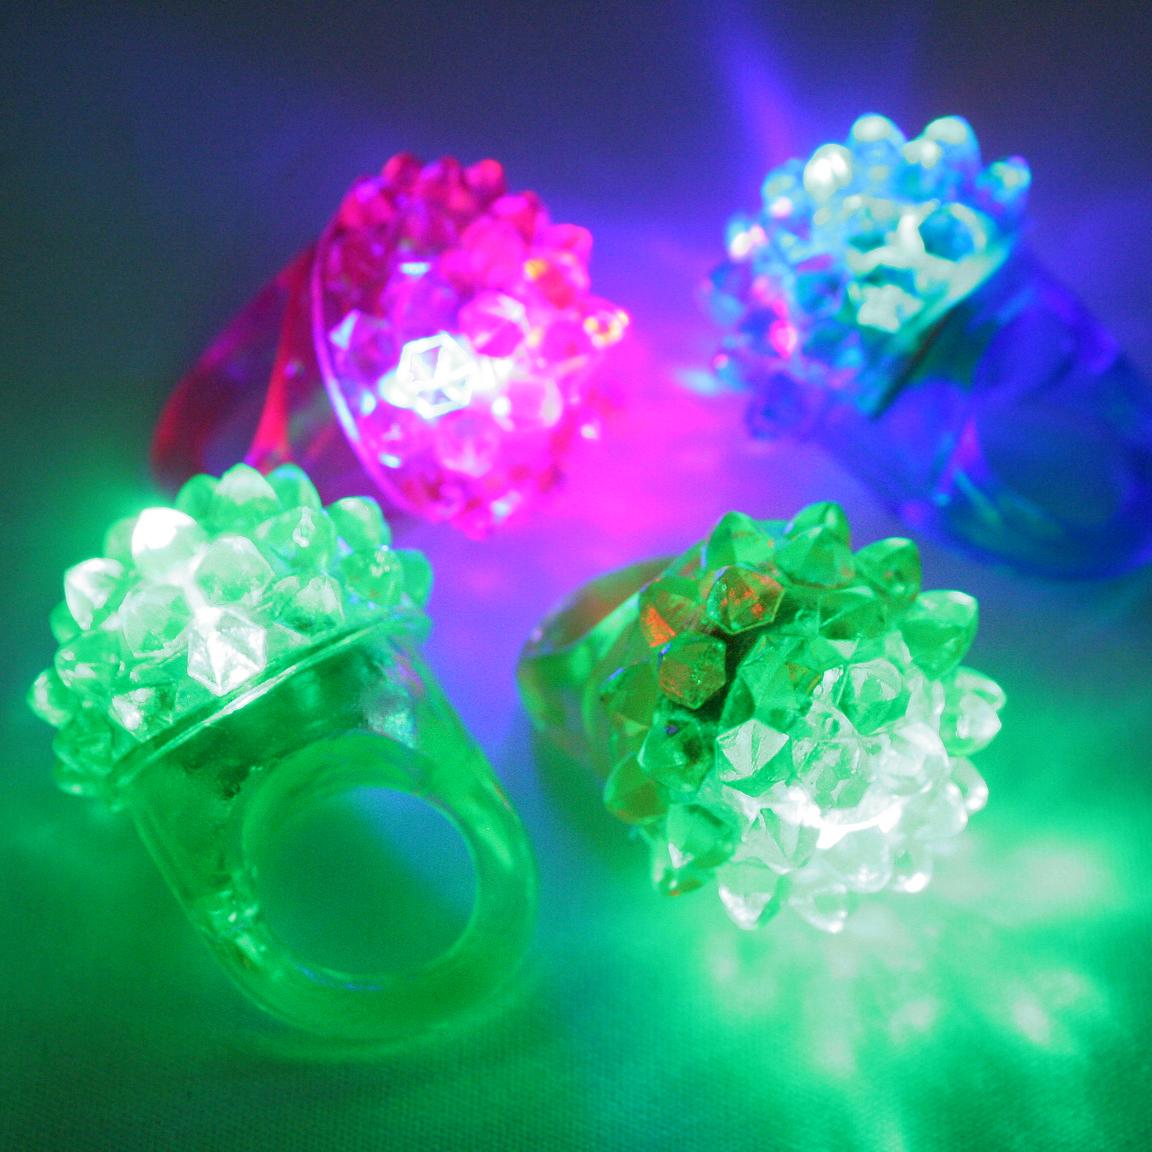 glcs-101toc 【ケース販売】光るフルーツ指輪(光彩フラワーリング) 720入(36個入×20)